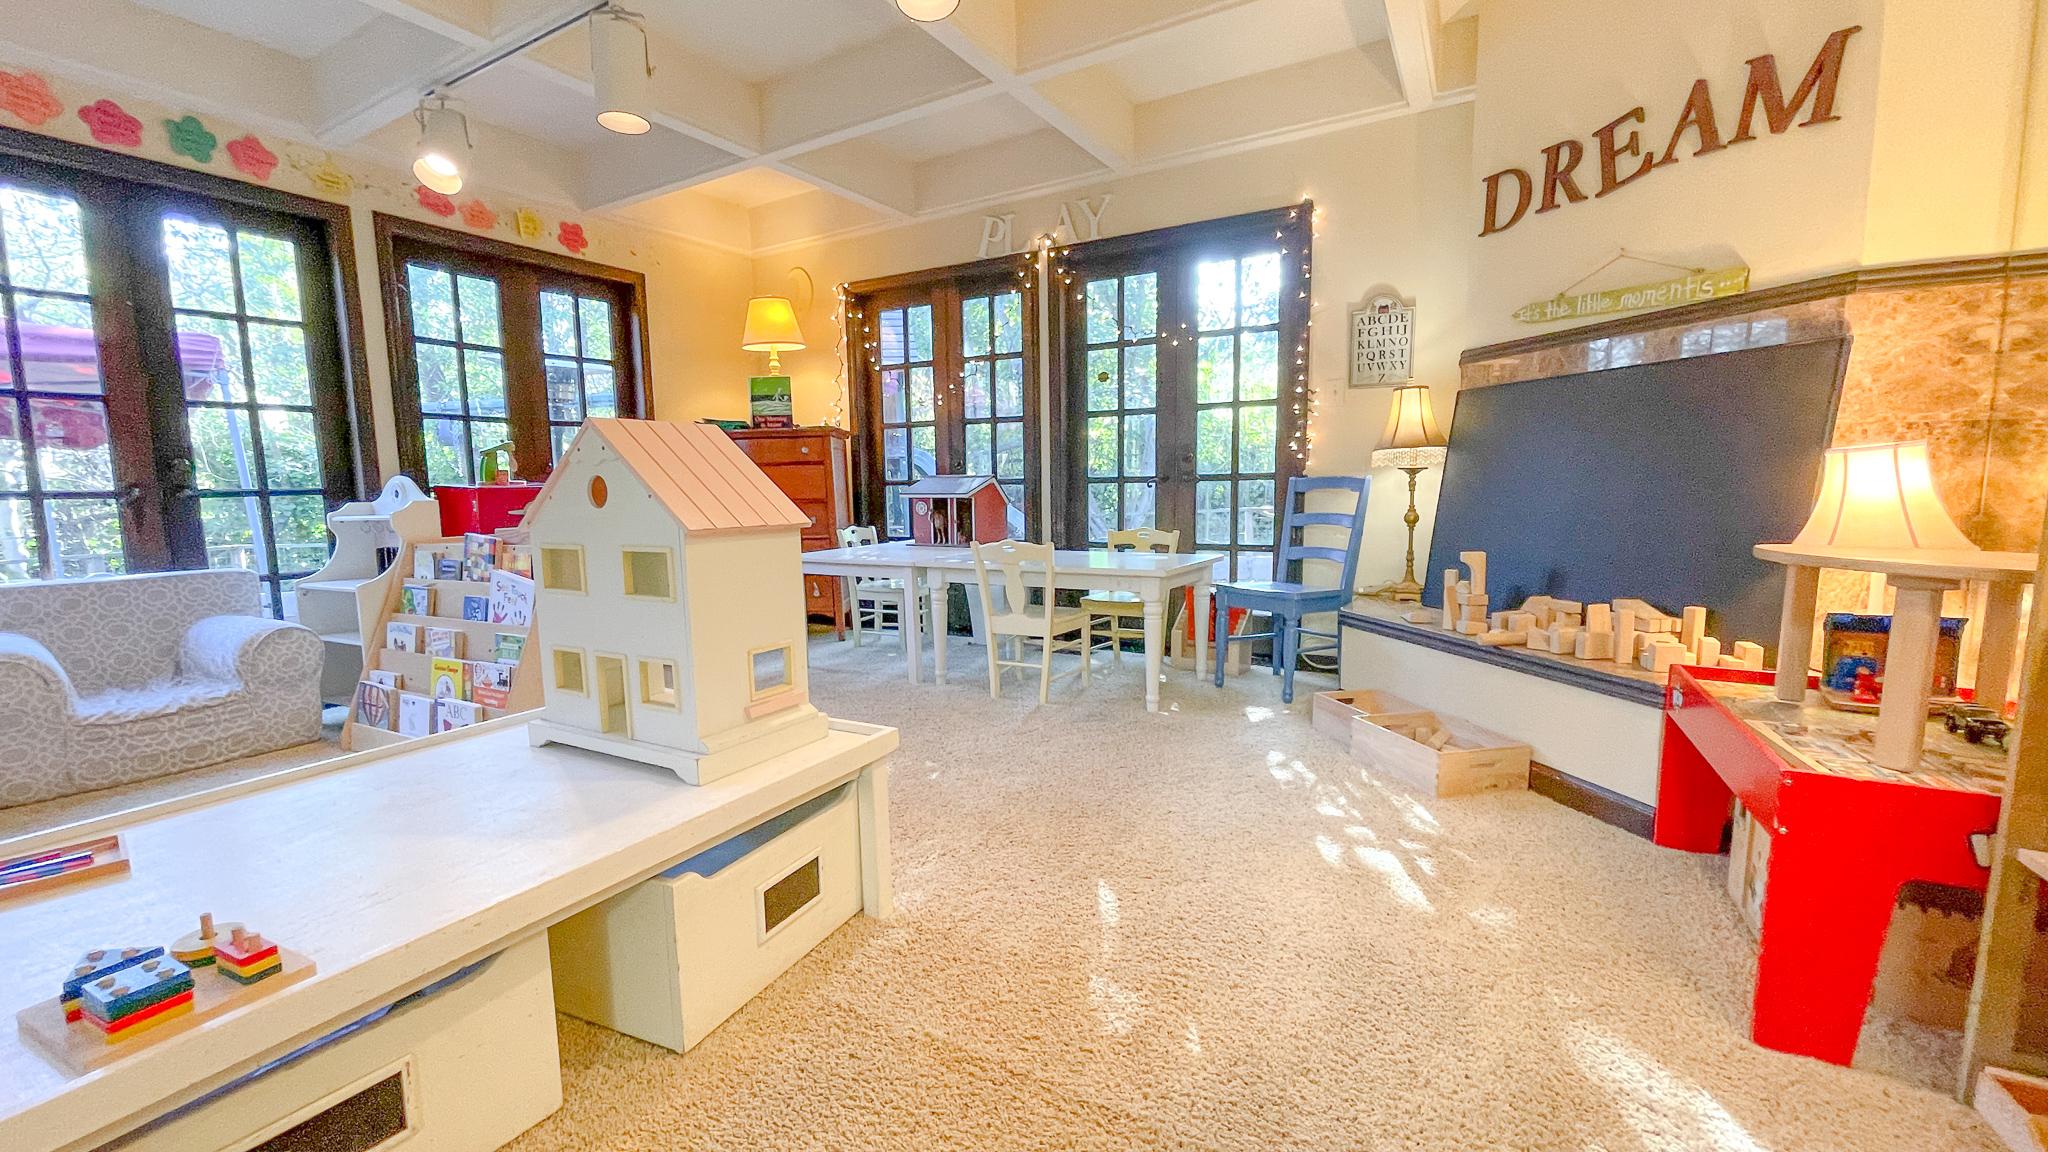 Ross Cottage Nursery School - City Of Ross, California